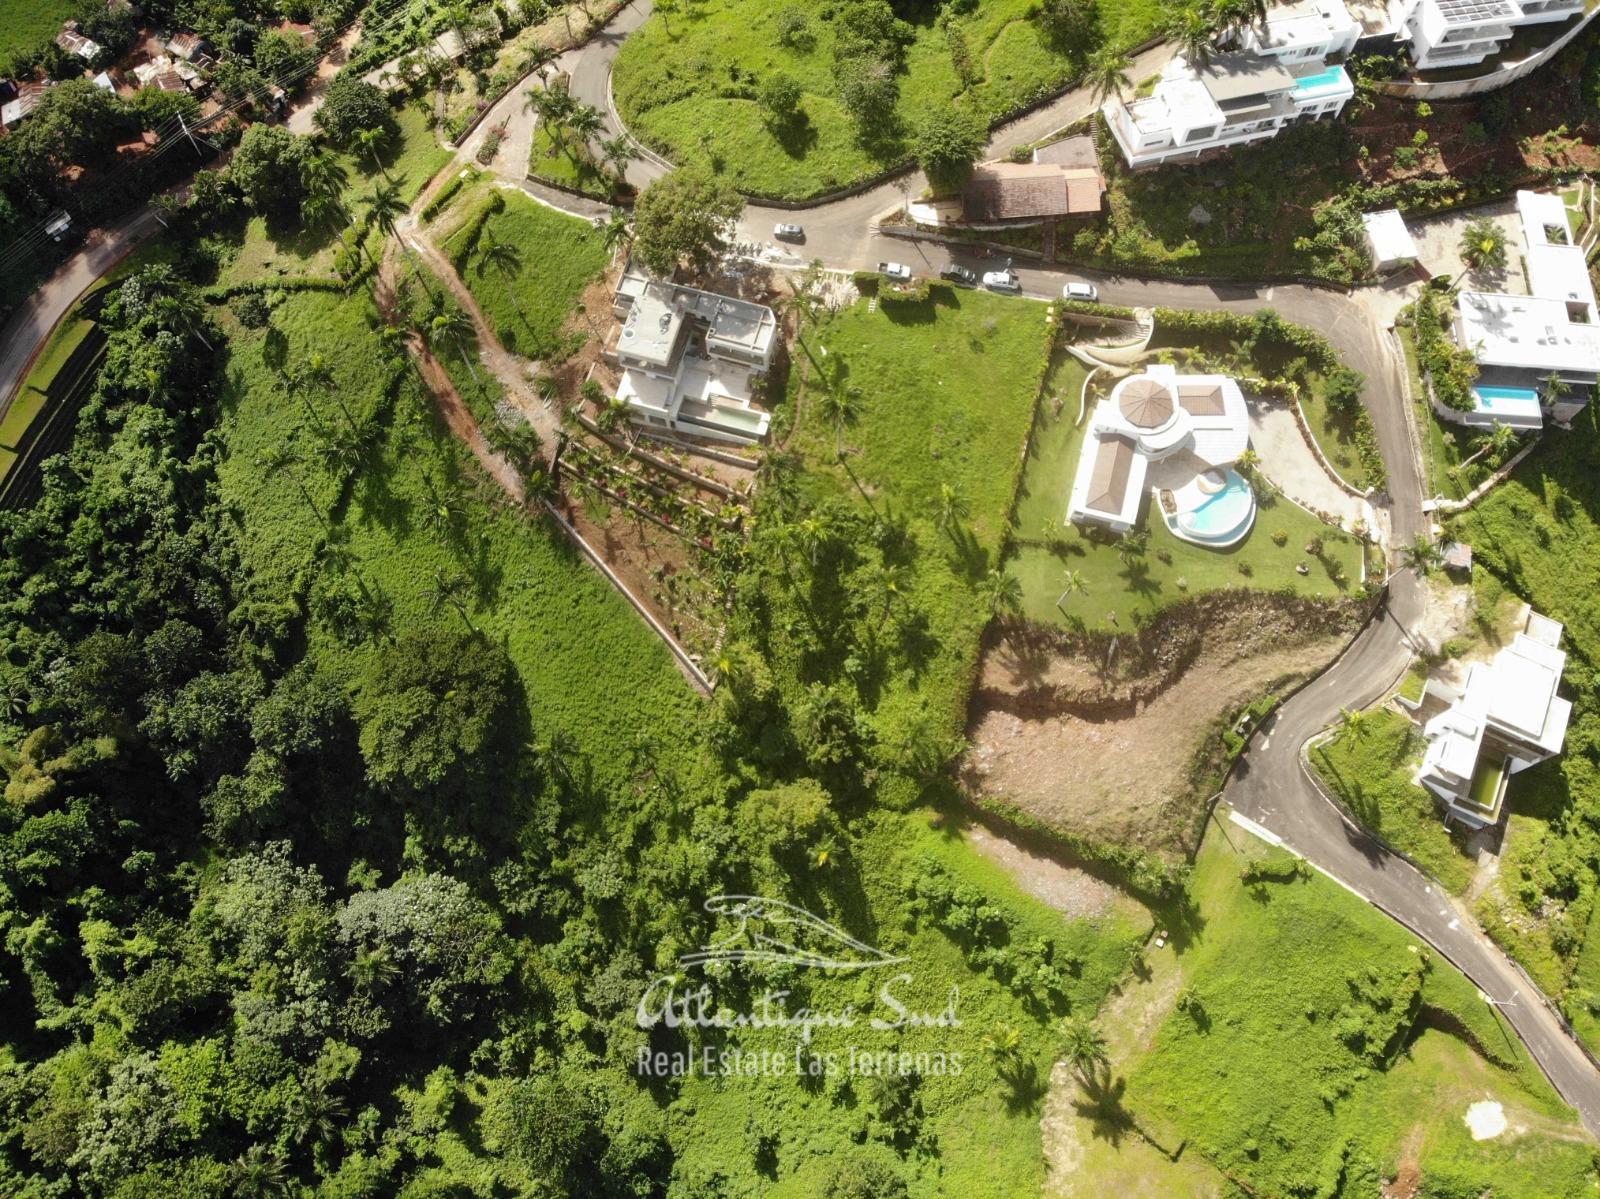 Hillside Lots for sale in Las Terrenas30.jpeg